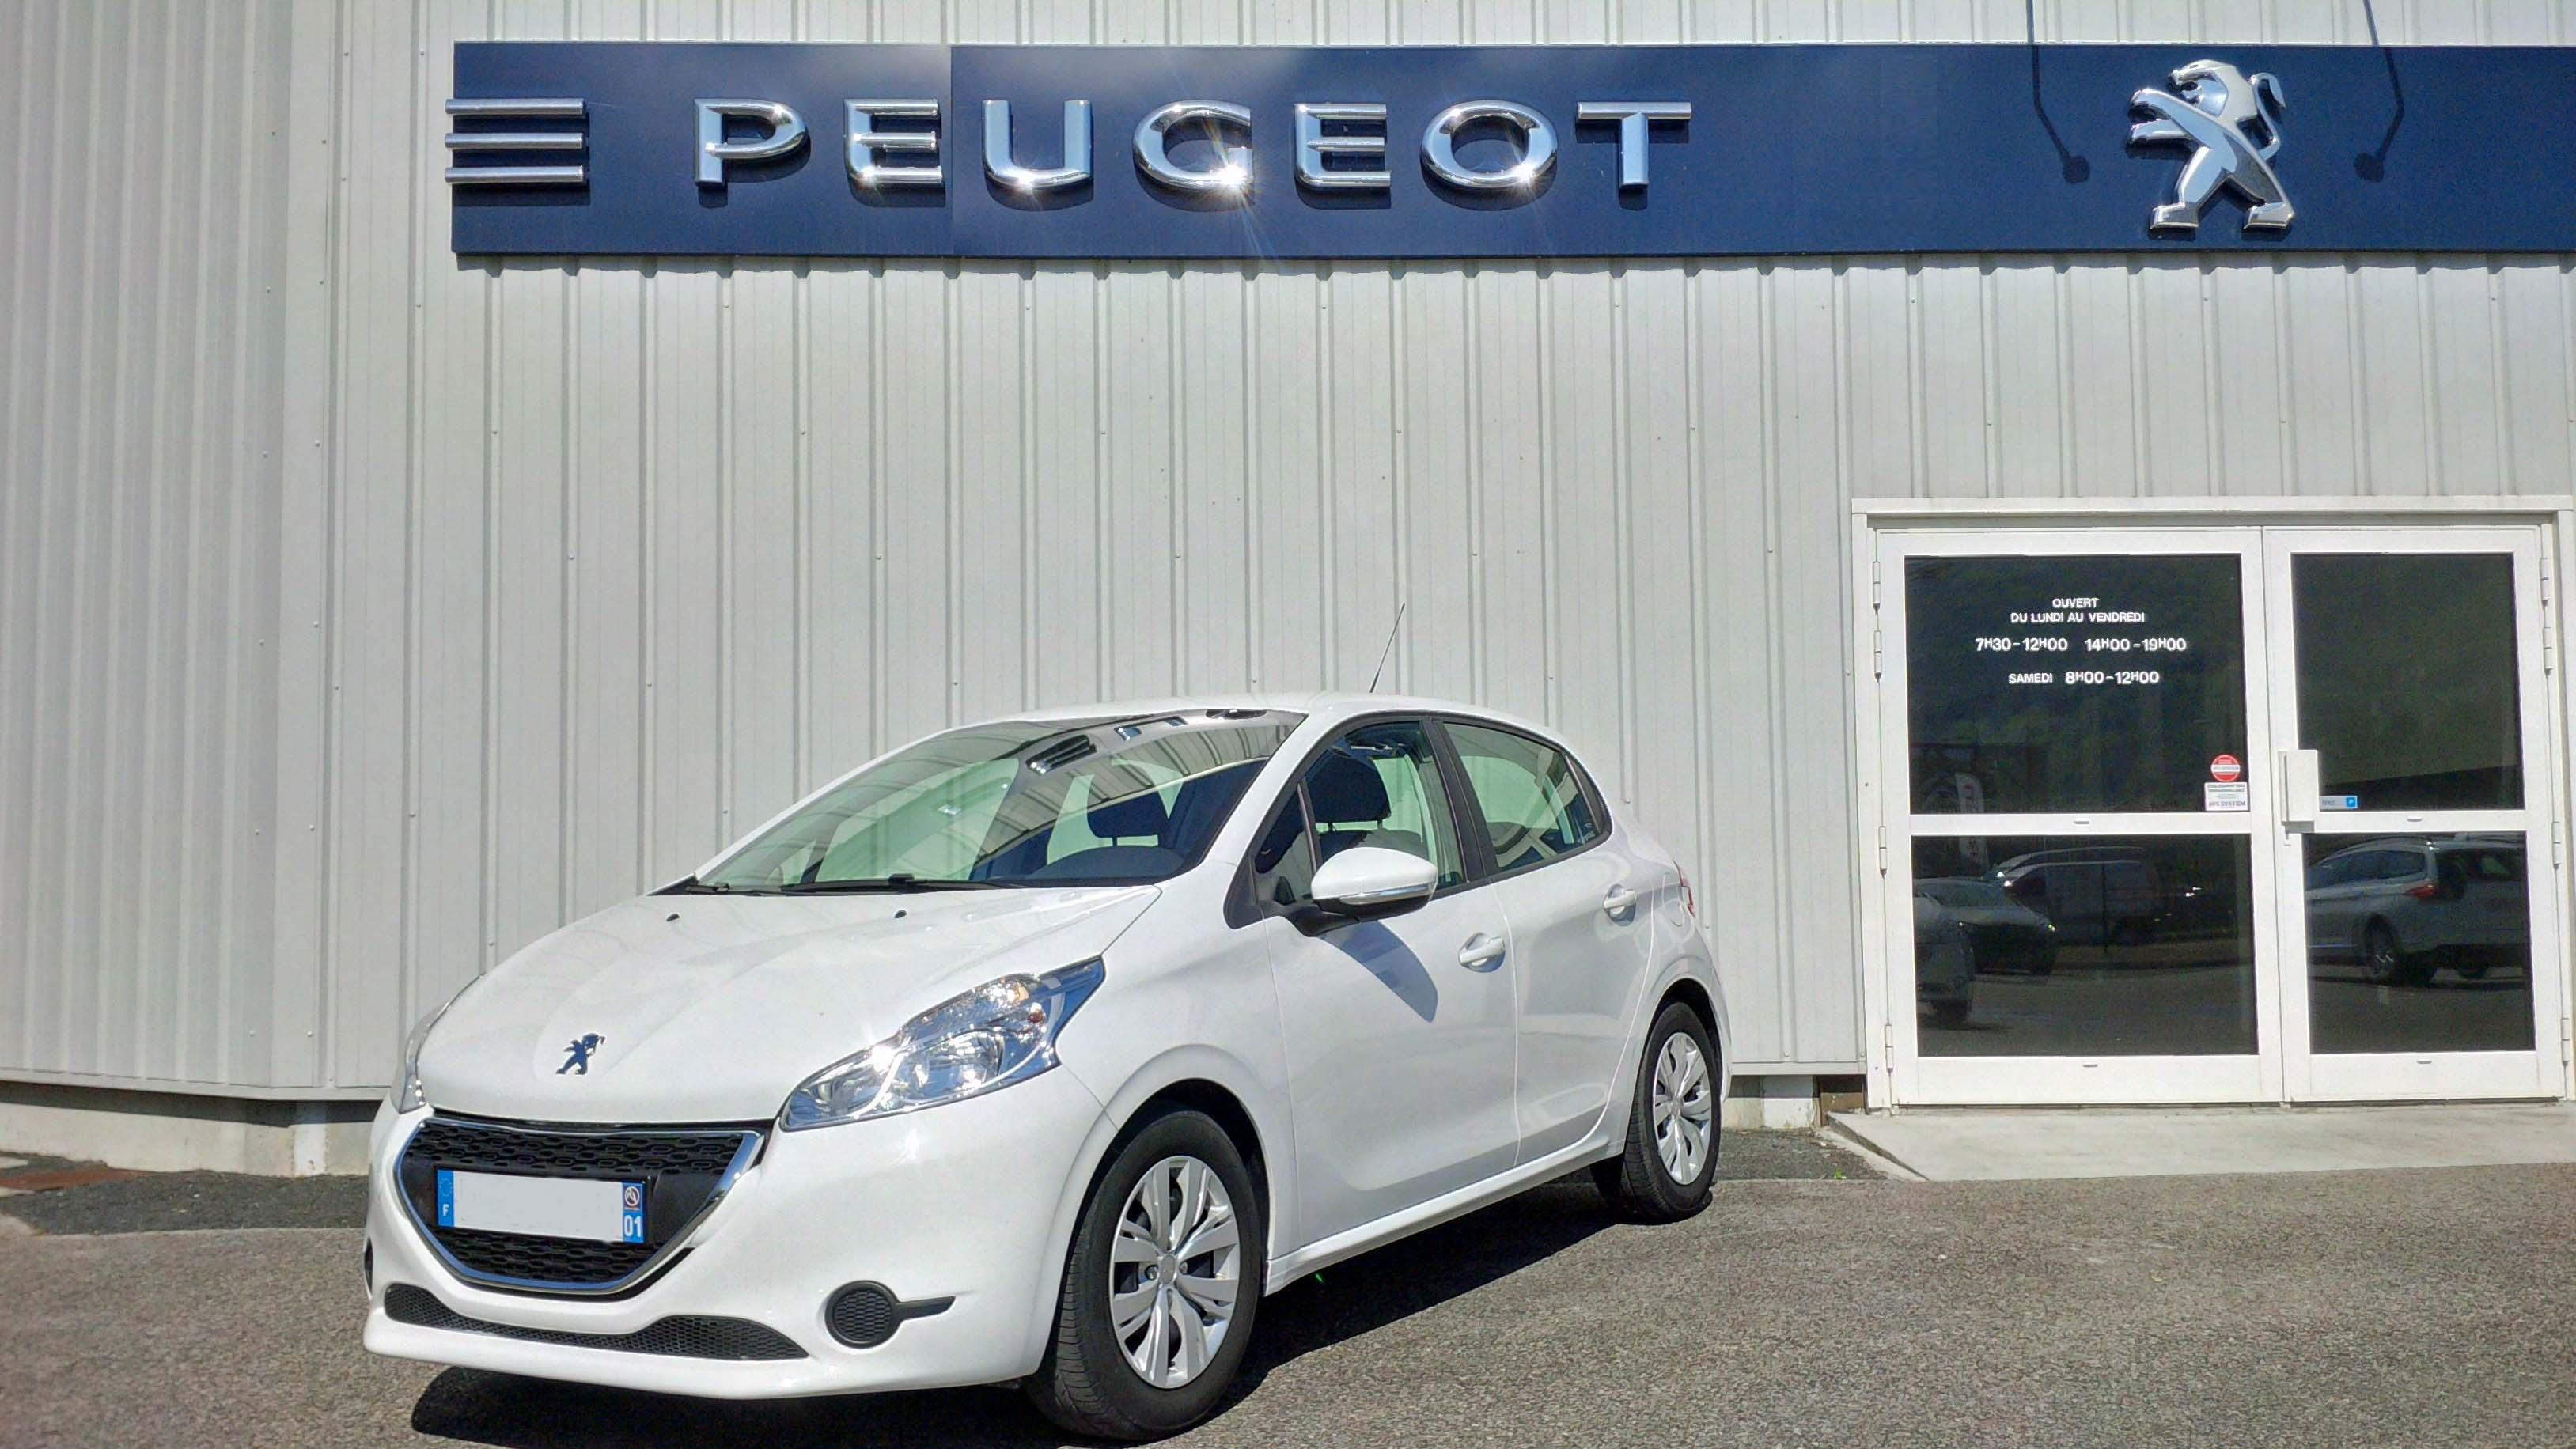 Peugeot lagnieu garage gauthier for Garage peugeot portugal